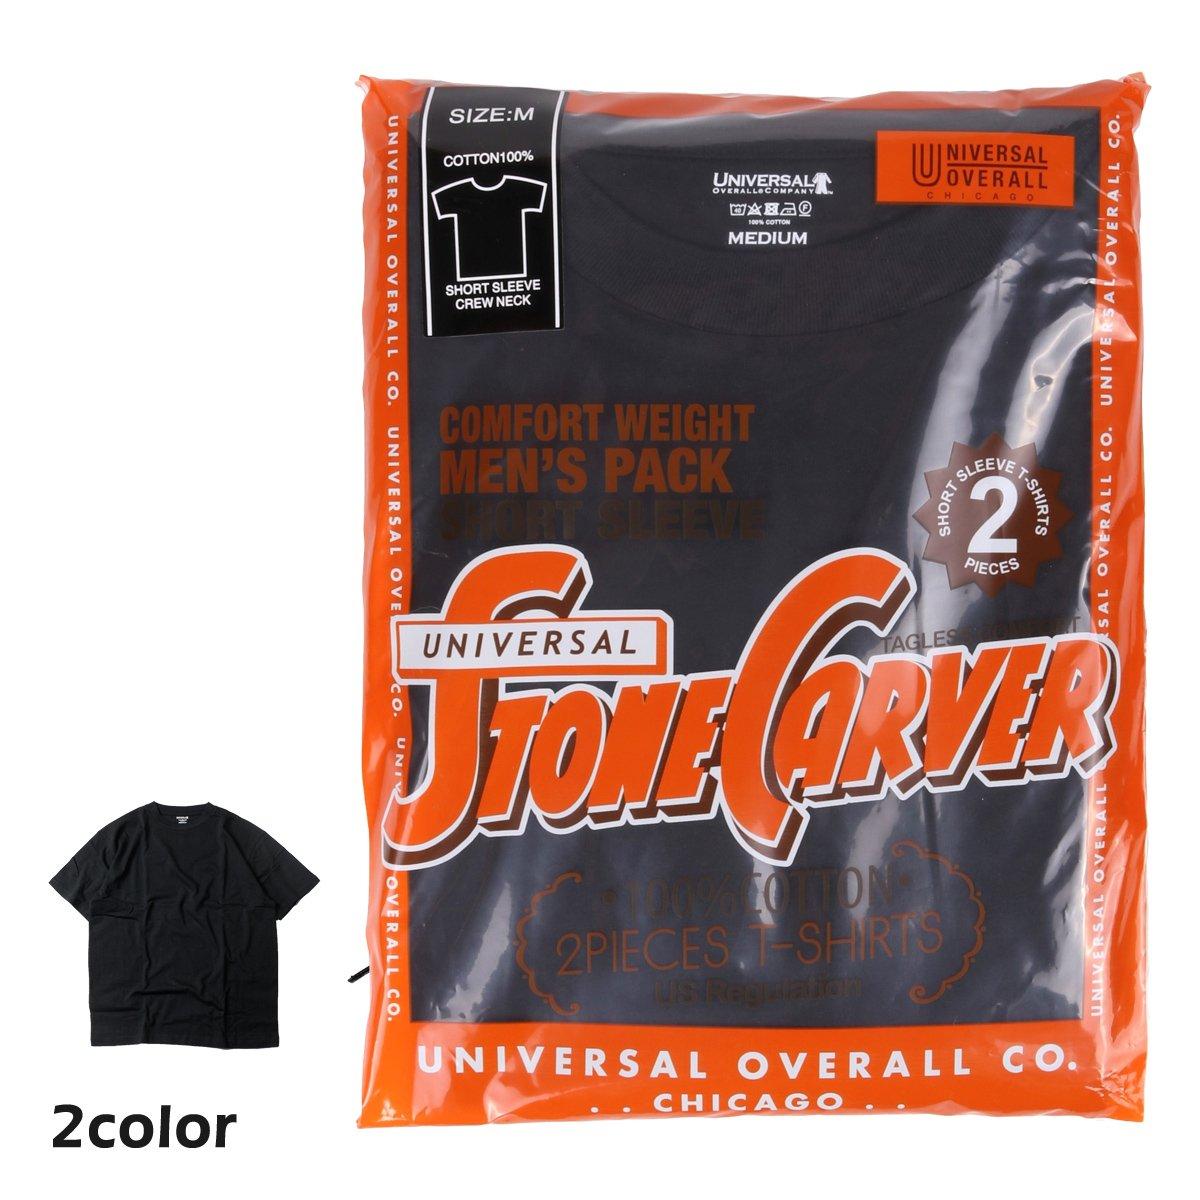 UNIVERSAL OVERALL ユニバーサルオーバーオール 2P クルーネックパックTシャツ